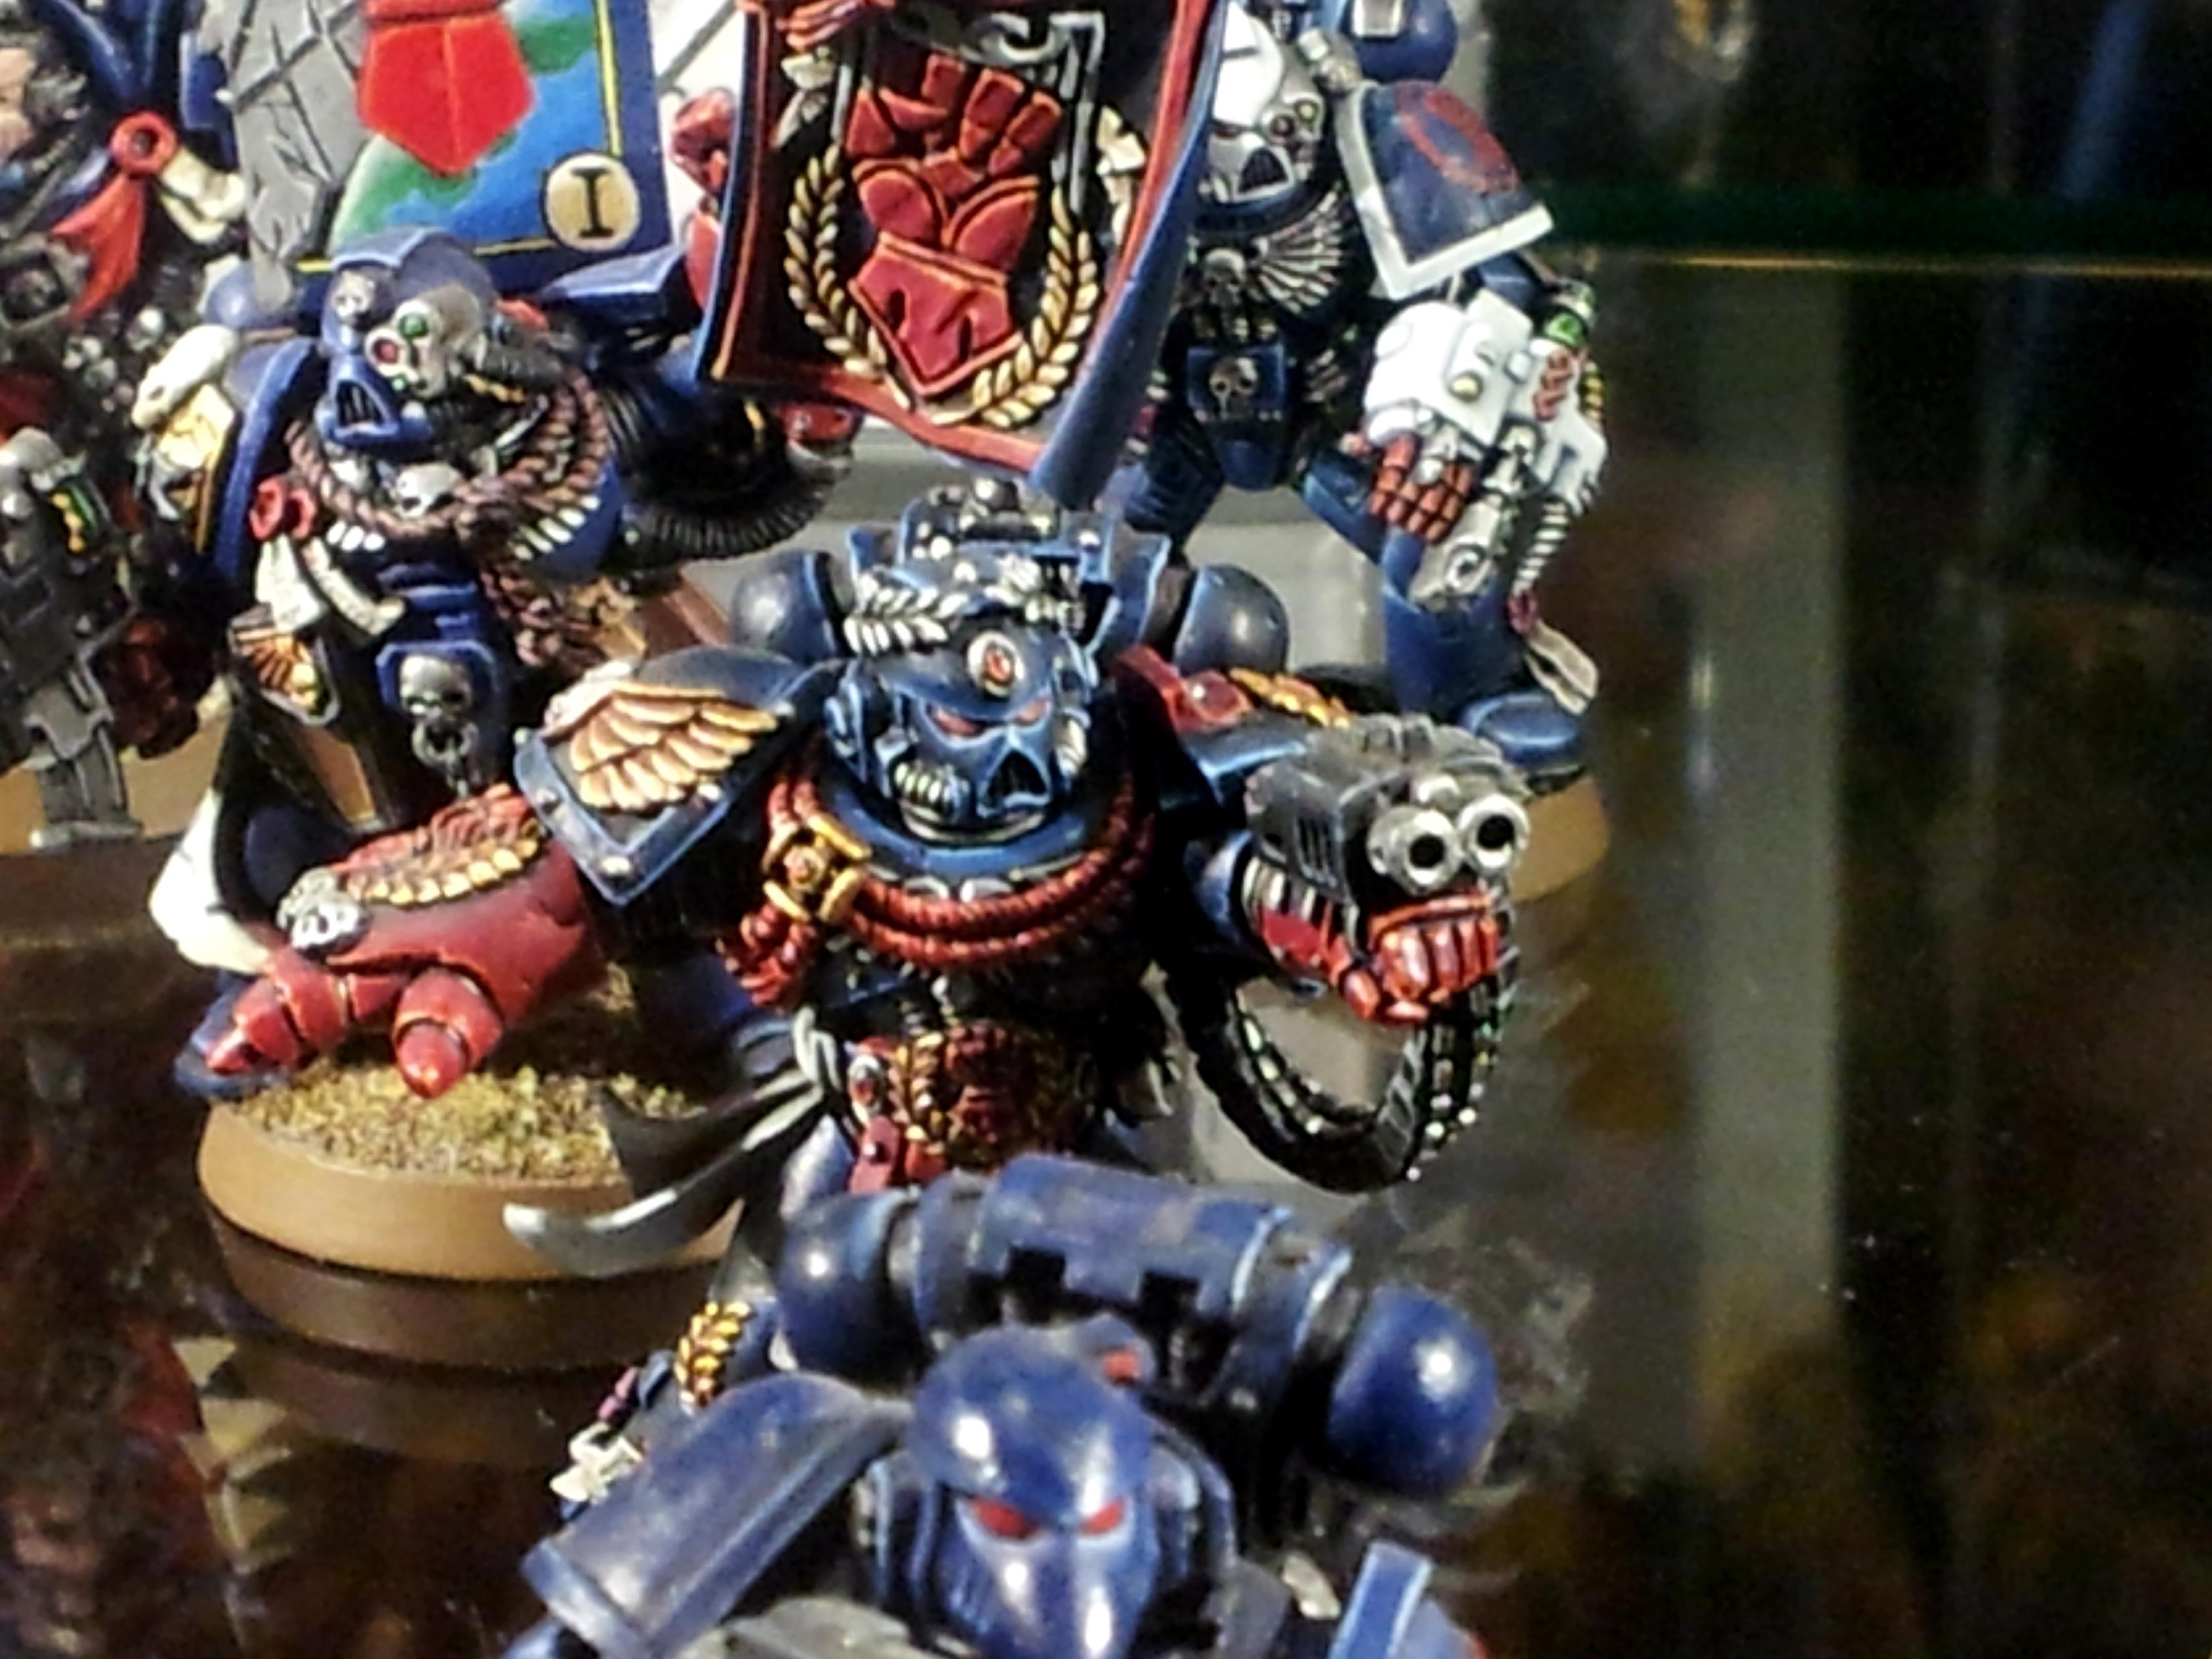 Crimson Fists, Deadshot, Pedro Kantor, Warhammer World